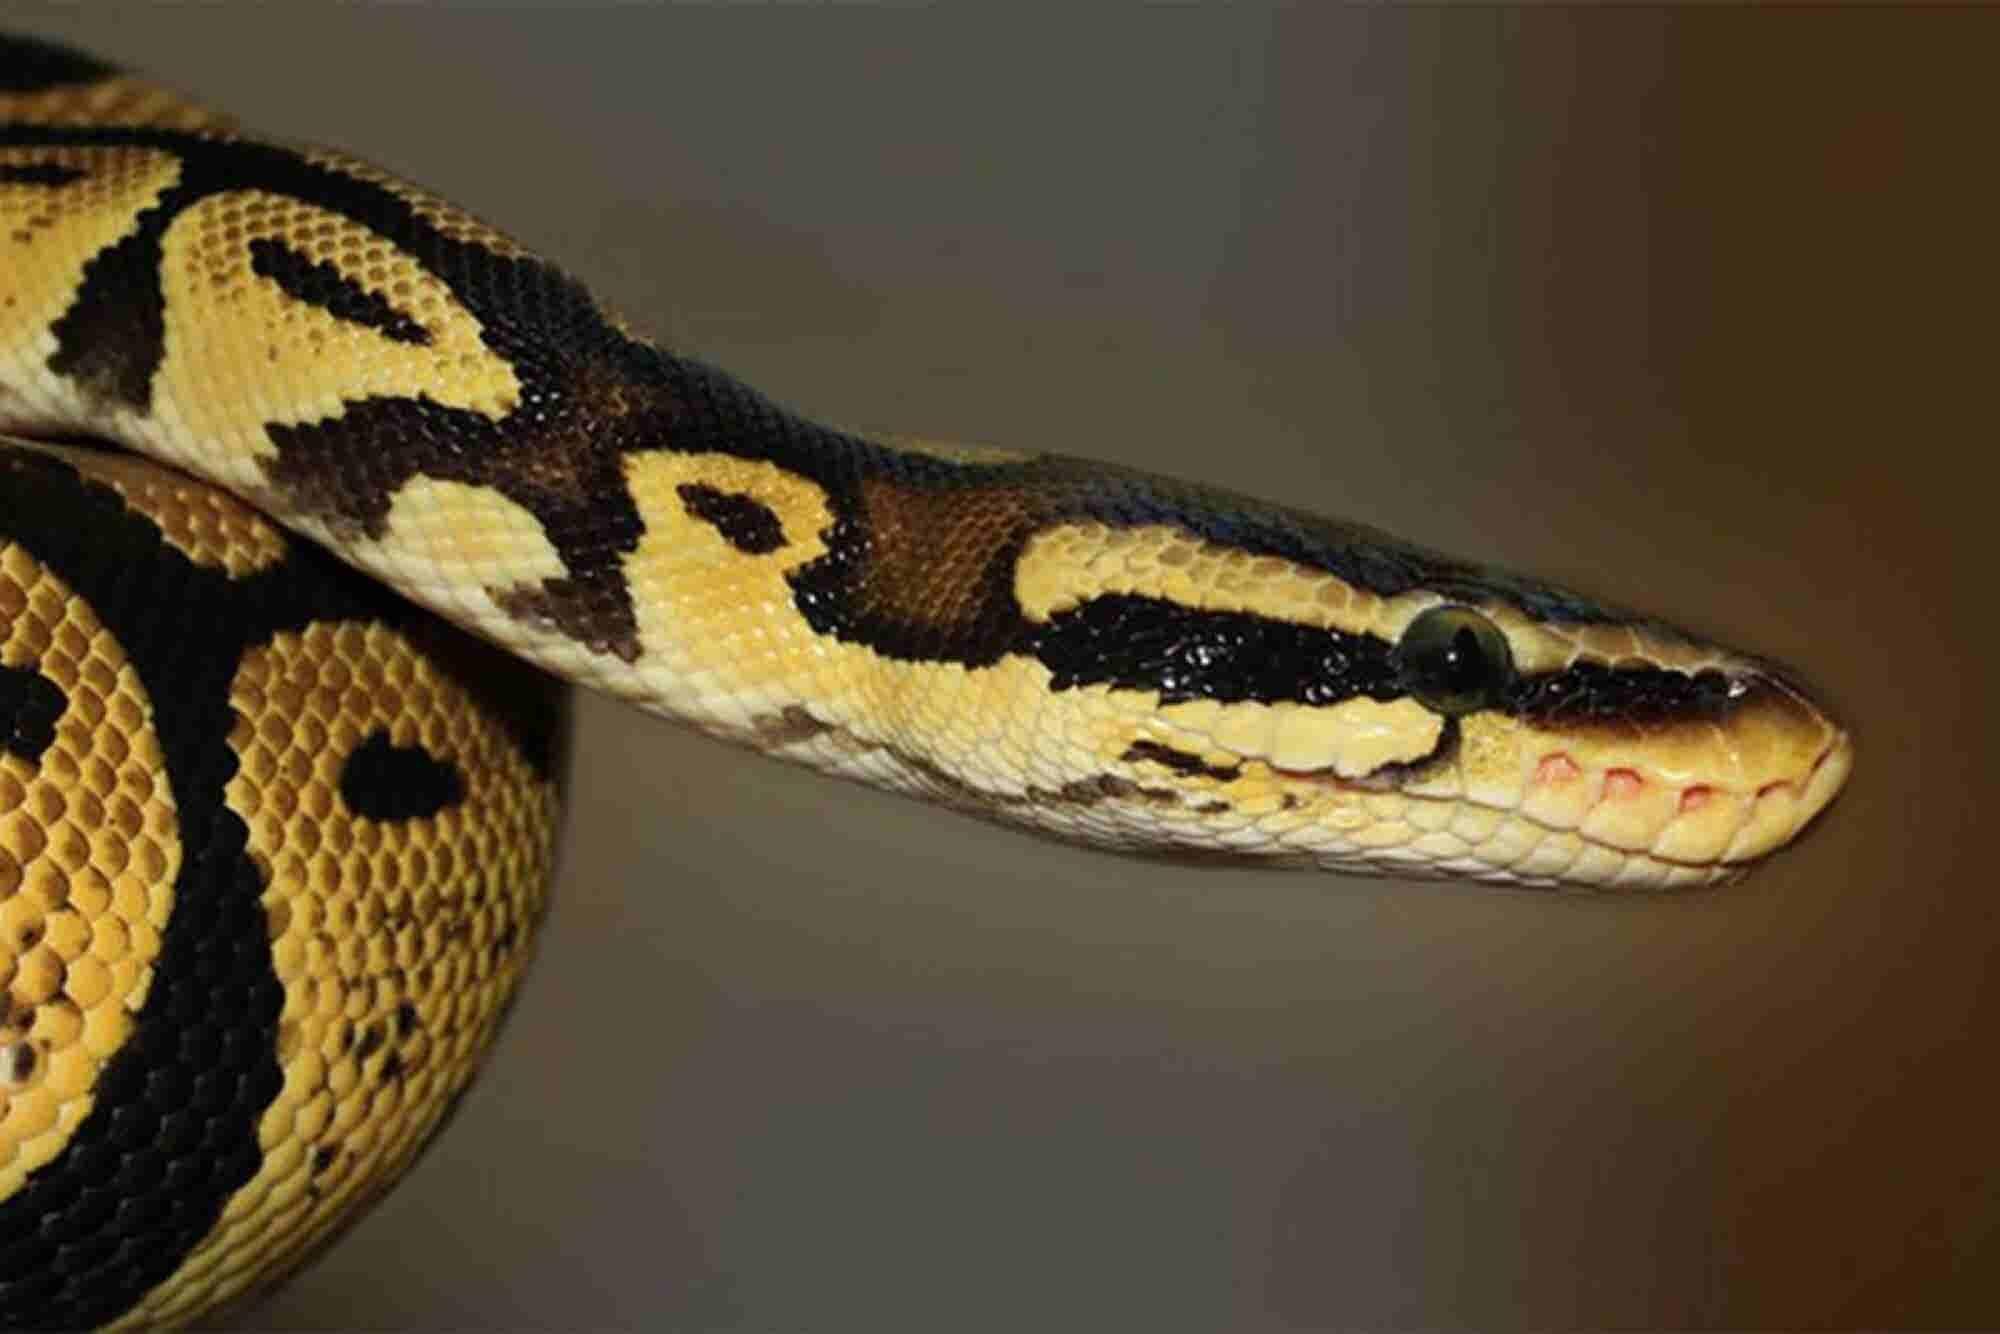 TSA Discovers Snake Inside External Hard Drive